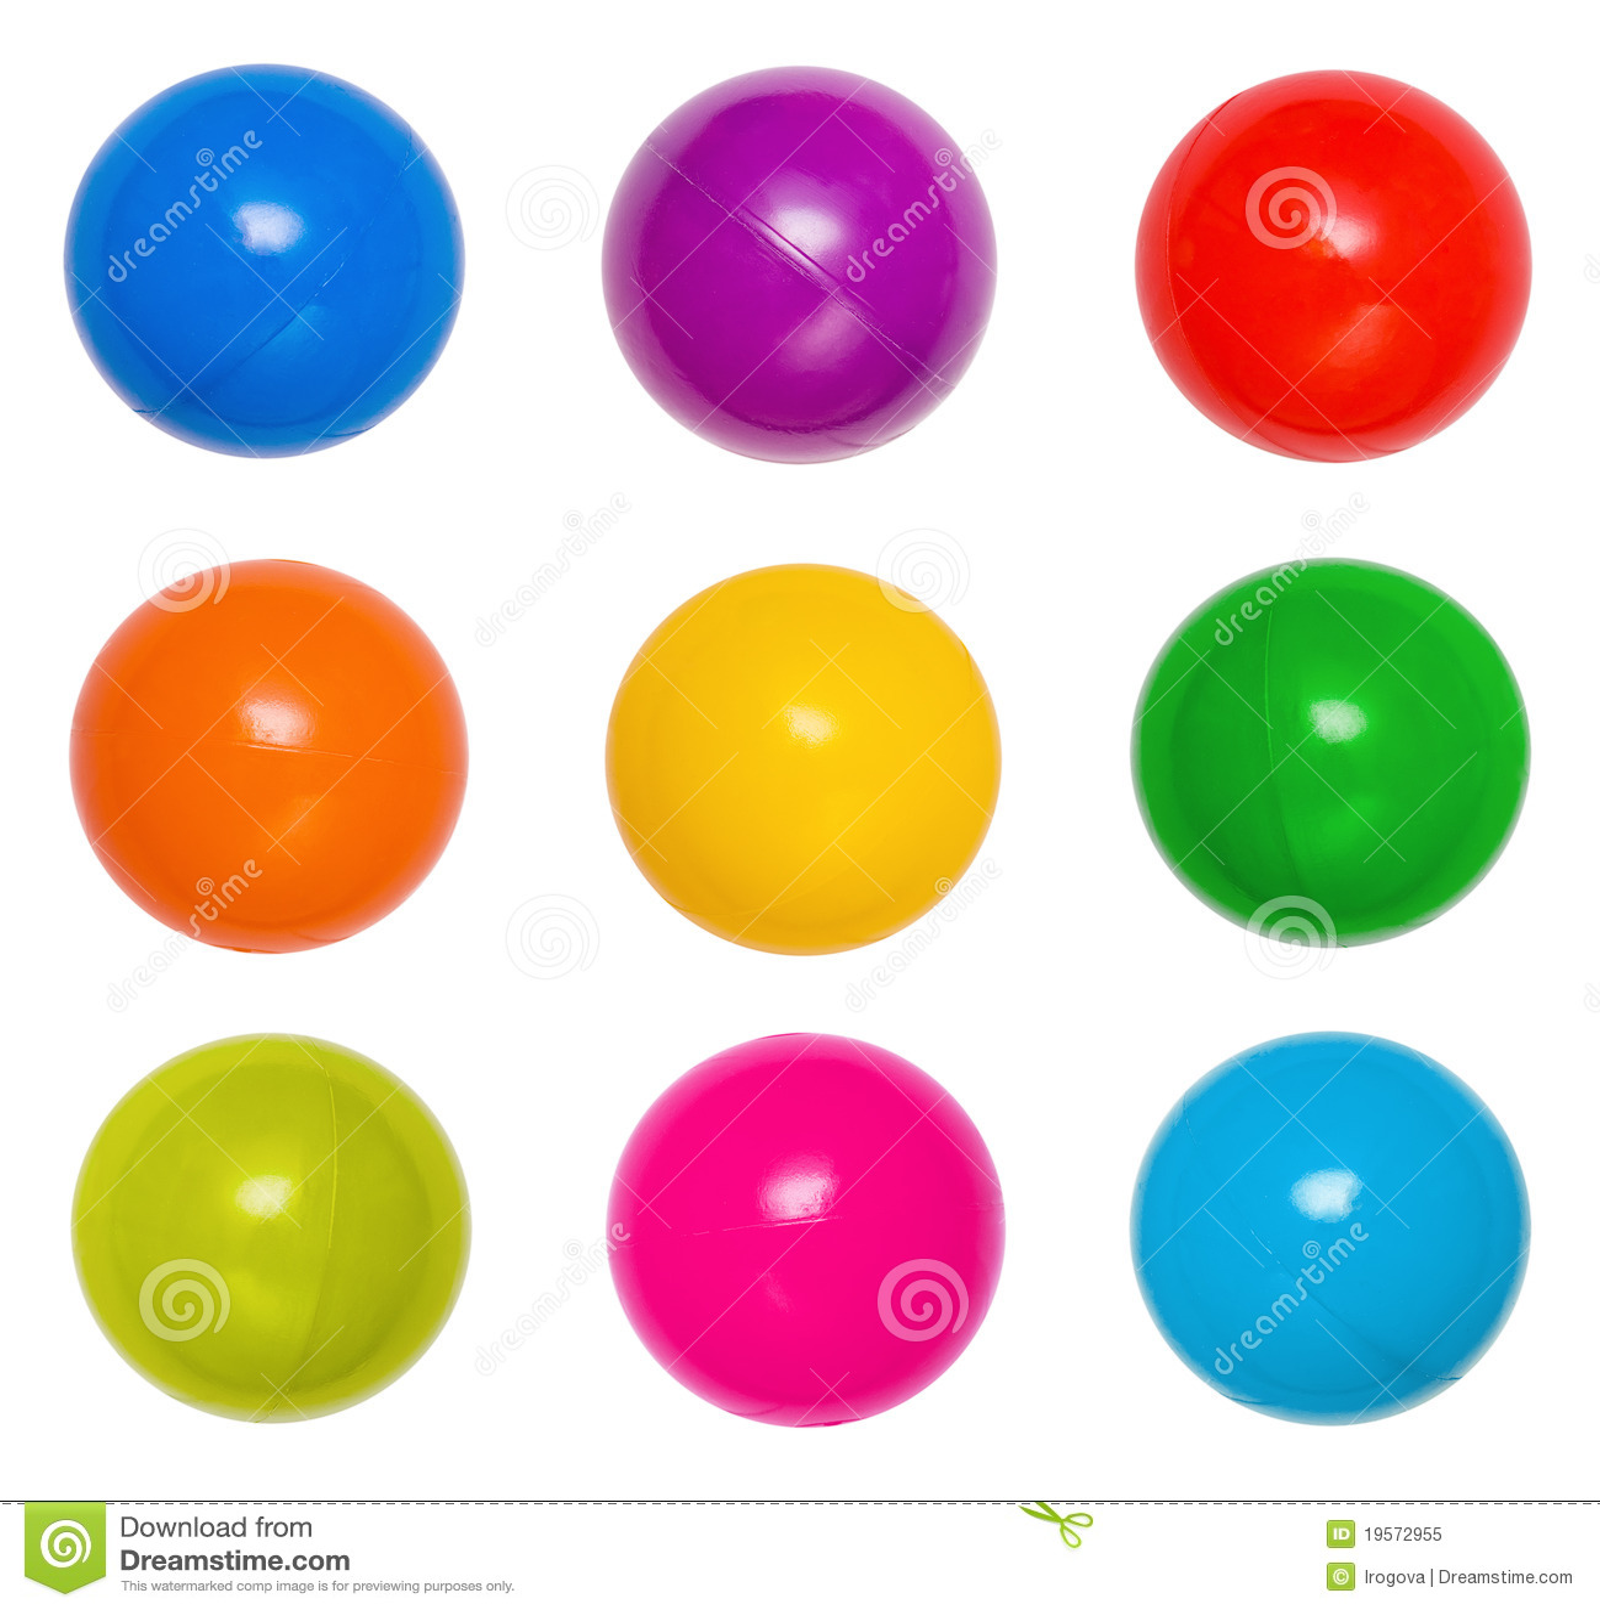 Many Colour Plastic Balls Royalty Free Stock Photo - Image: 19572955